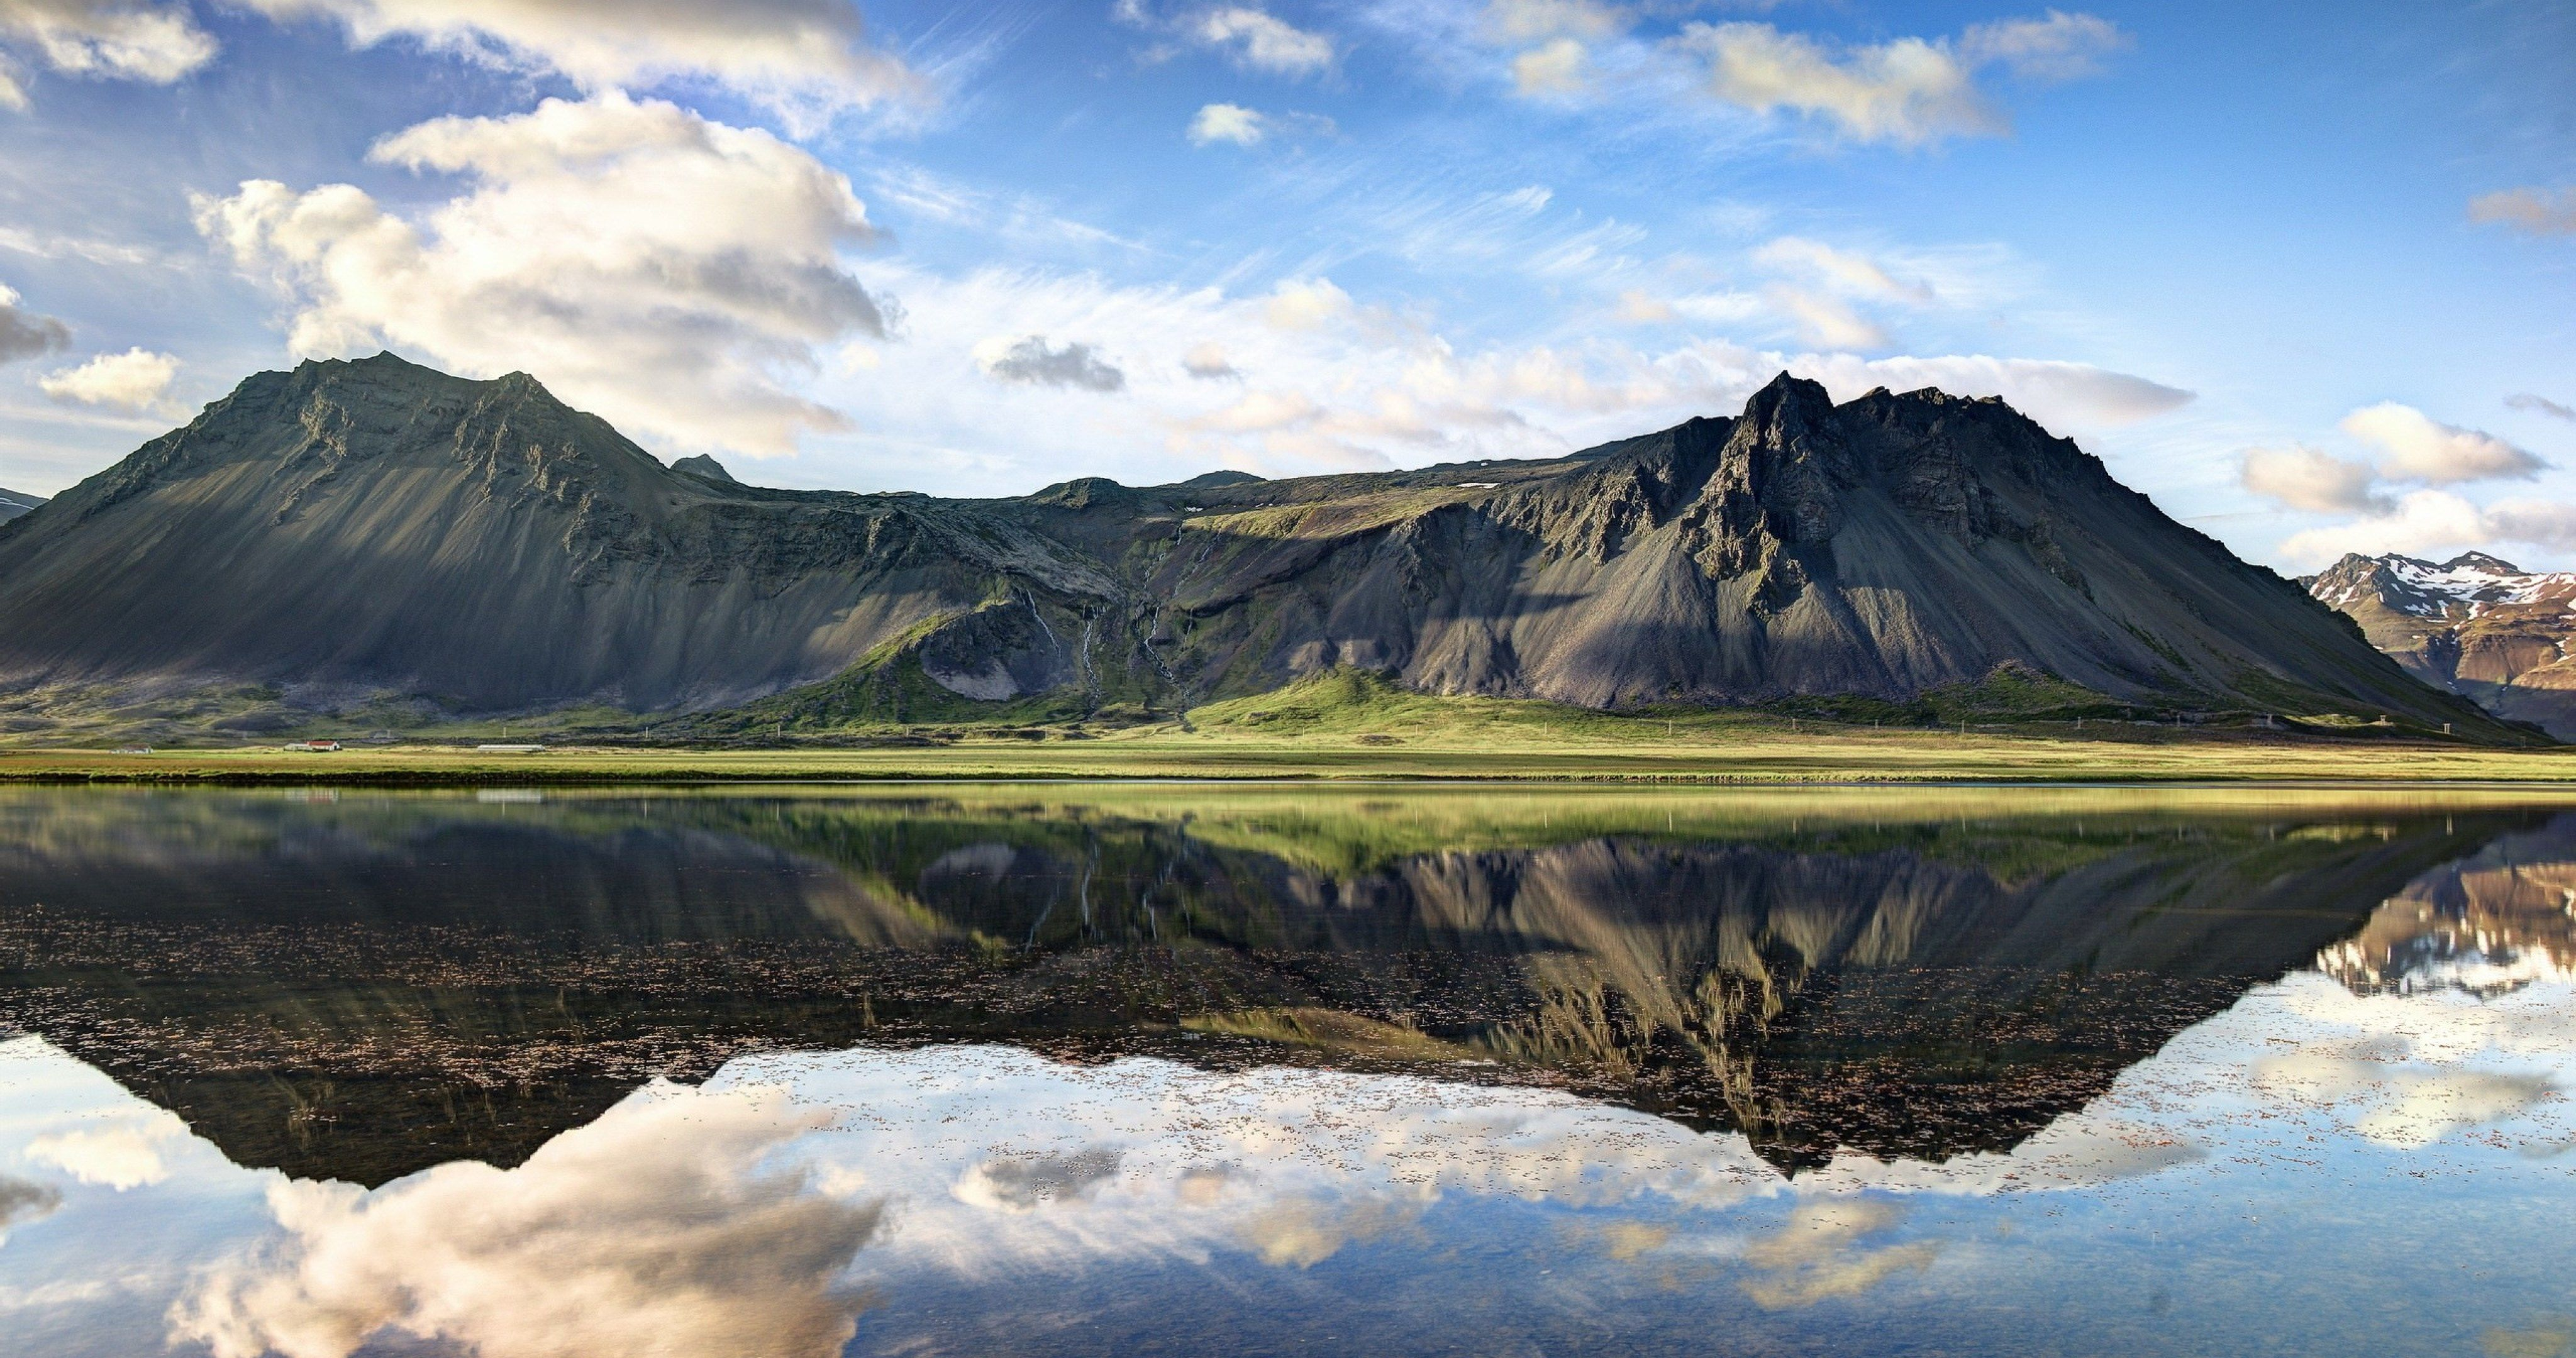 Mountain Reflection On Lake Wallpaper 4k Ultra Hd Wallpaper Iceland Landscape Mountain Reflection Iceland Travel